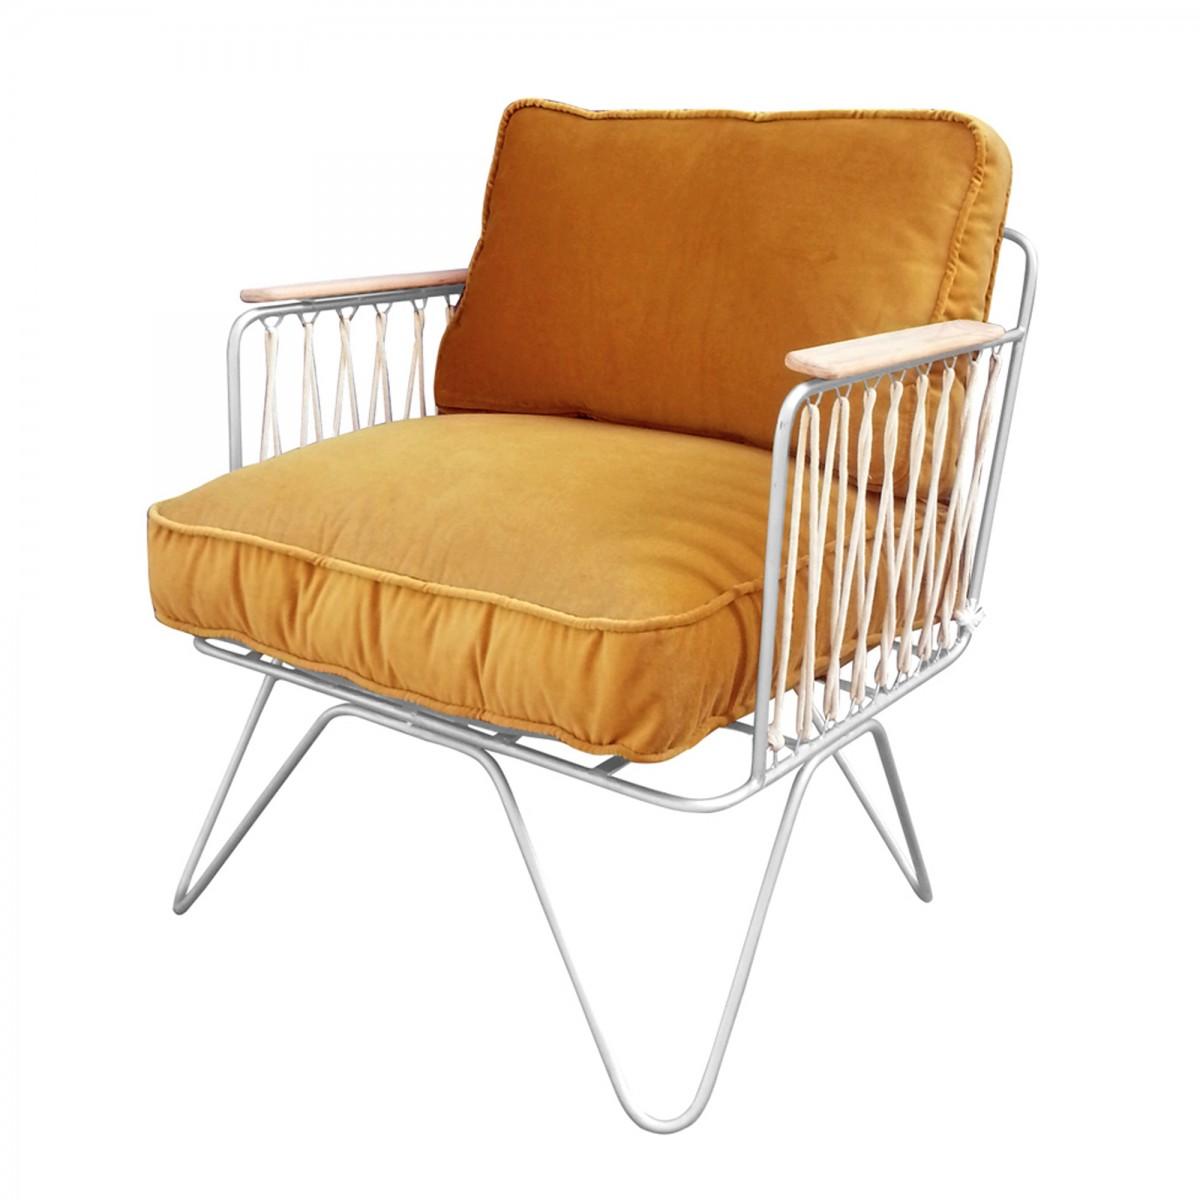 fauteuil croisette velours camel honore. Black Bedroom Furniture Sets. Home Design Ideas